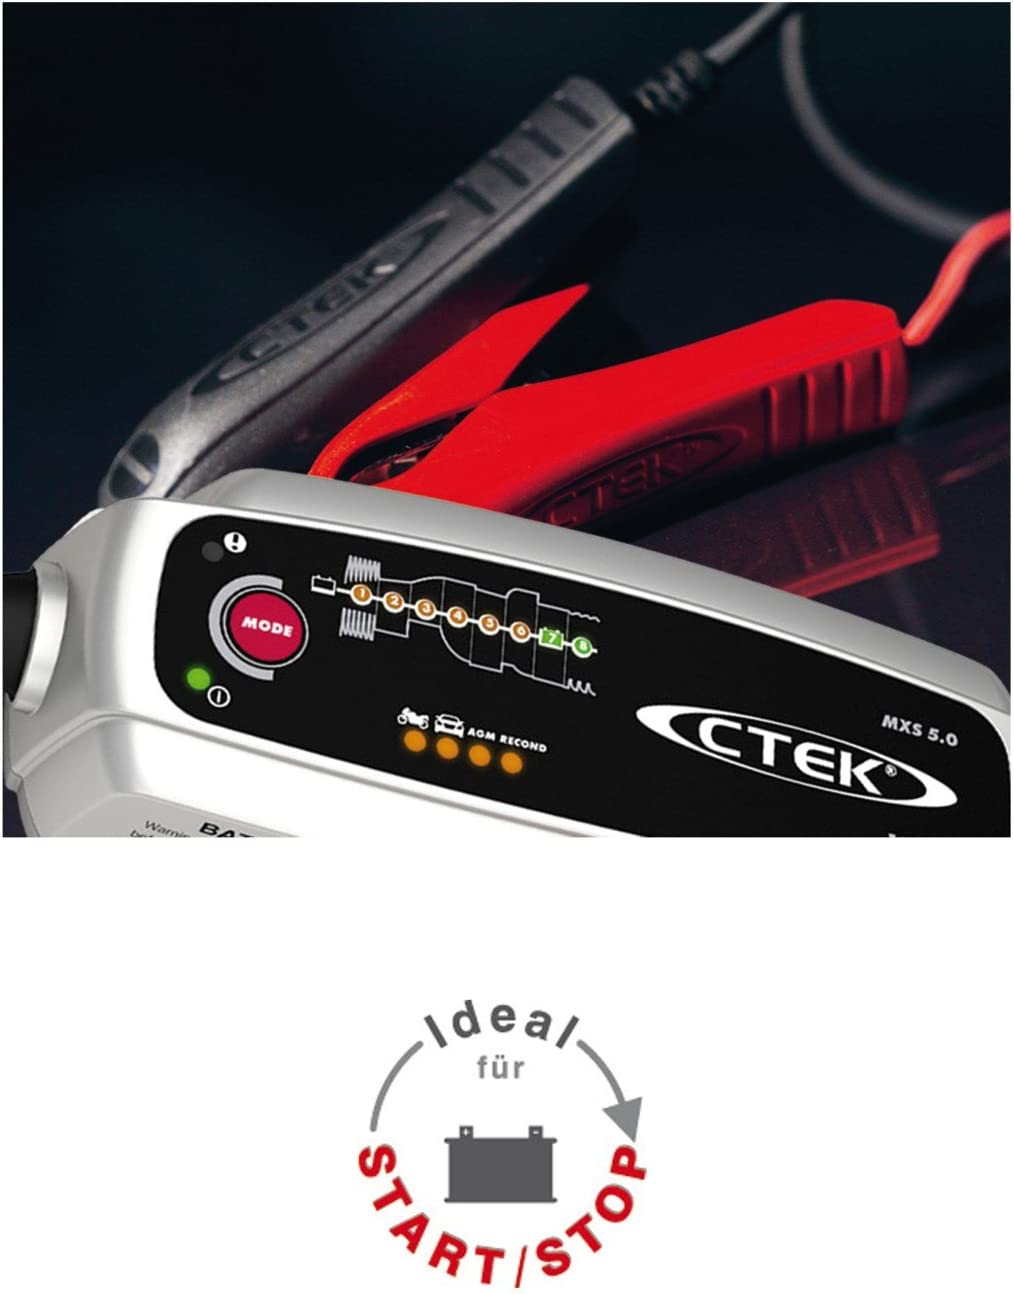 Ctek MXS 5.0/ battery Sense bater/ía Cargador de bater/ía W/ächter laderhal tungs dispositivo